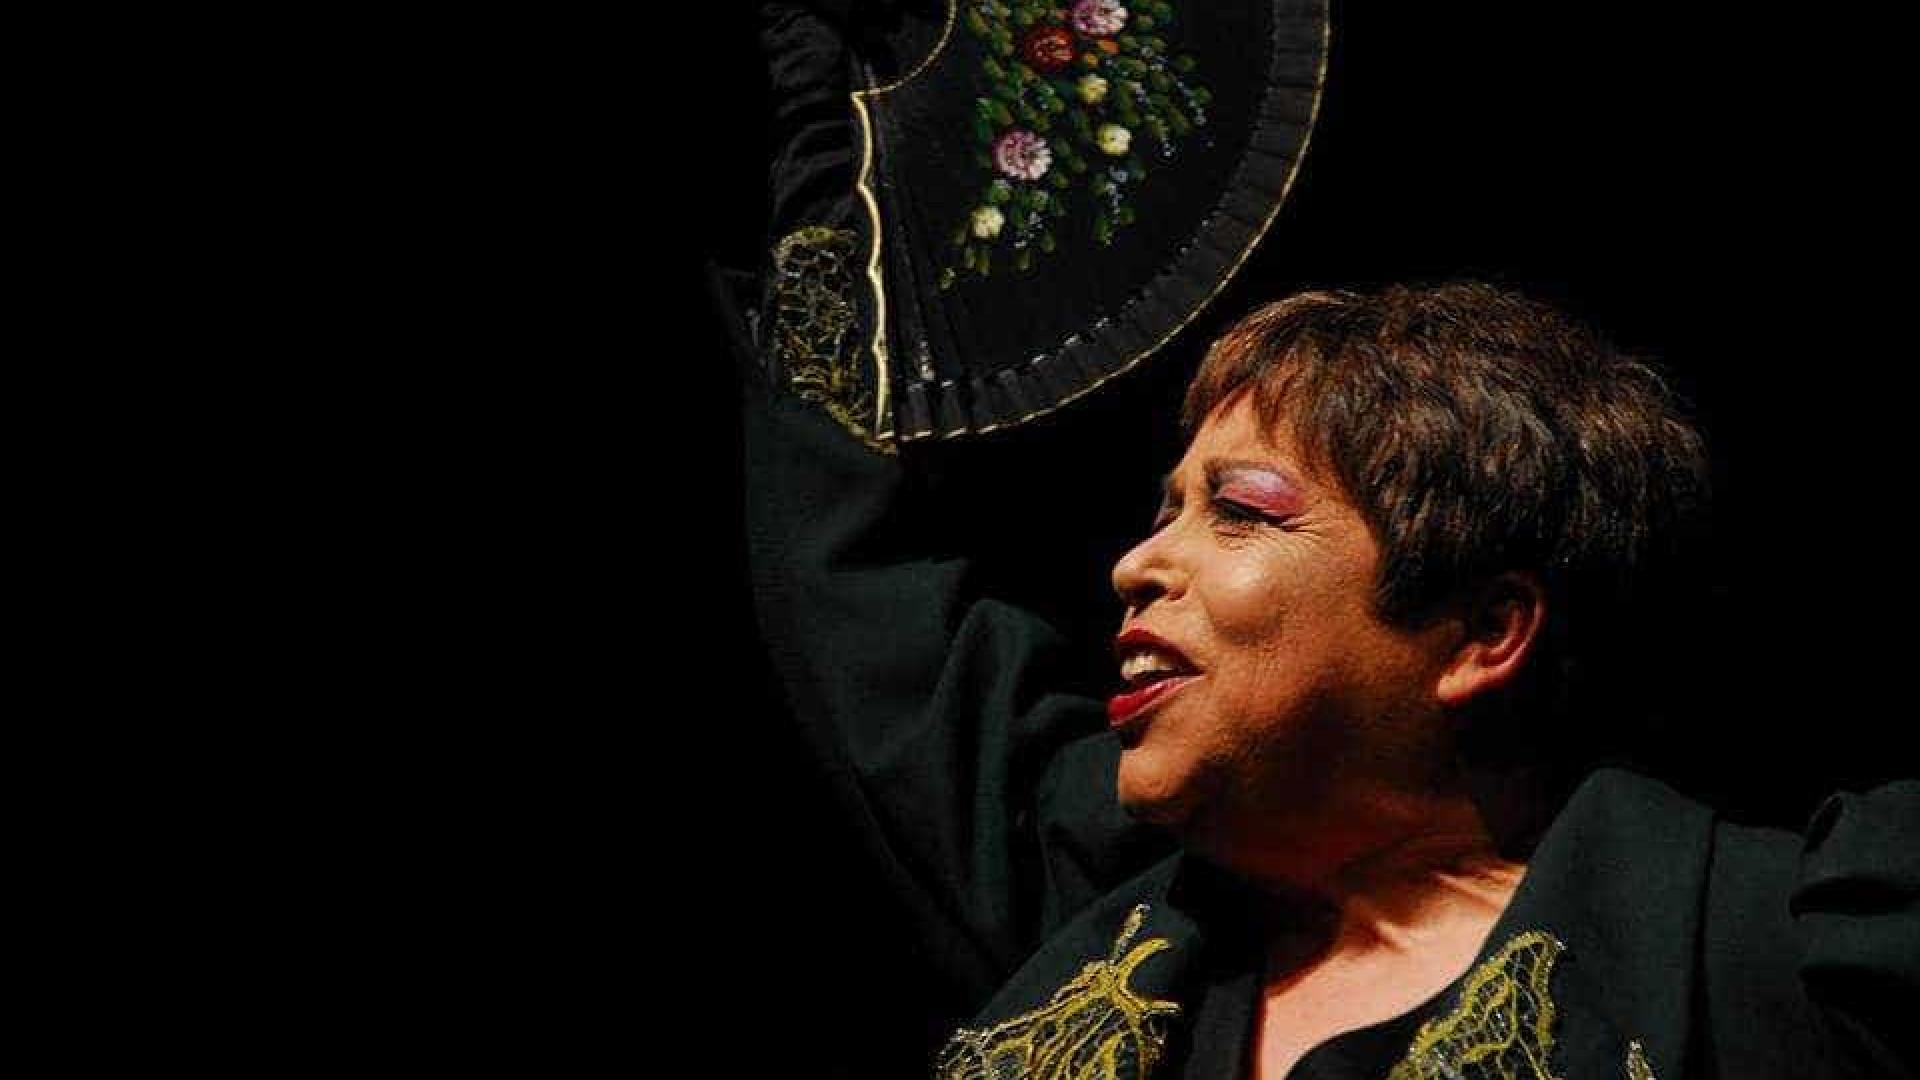 Maria Vieira reage a polémica de psicóloga sobre homossexuais